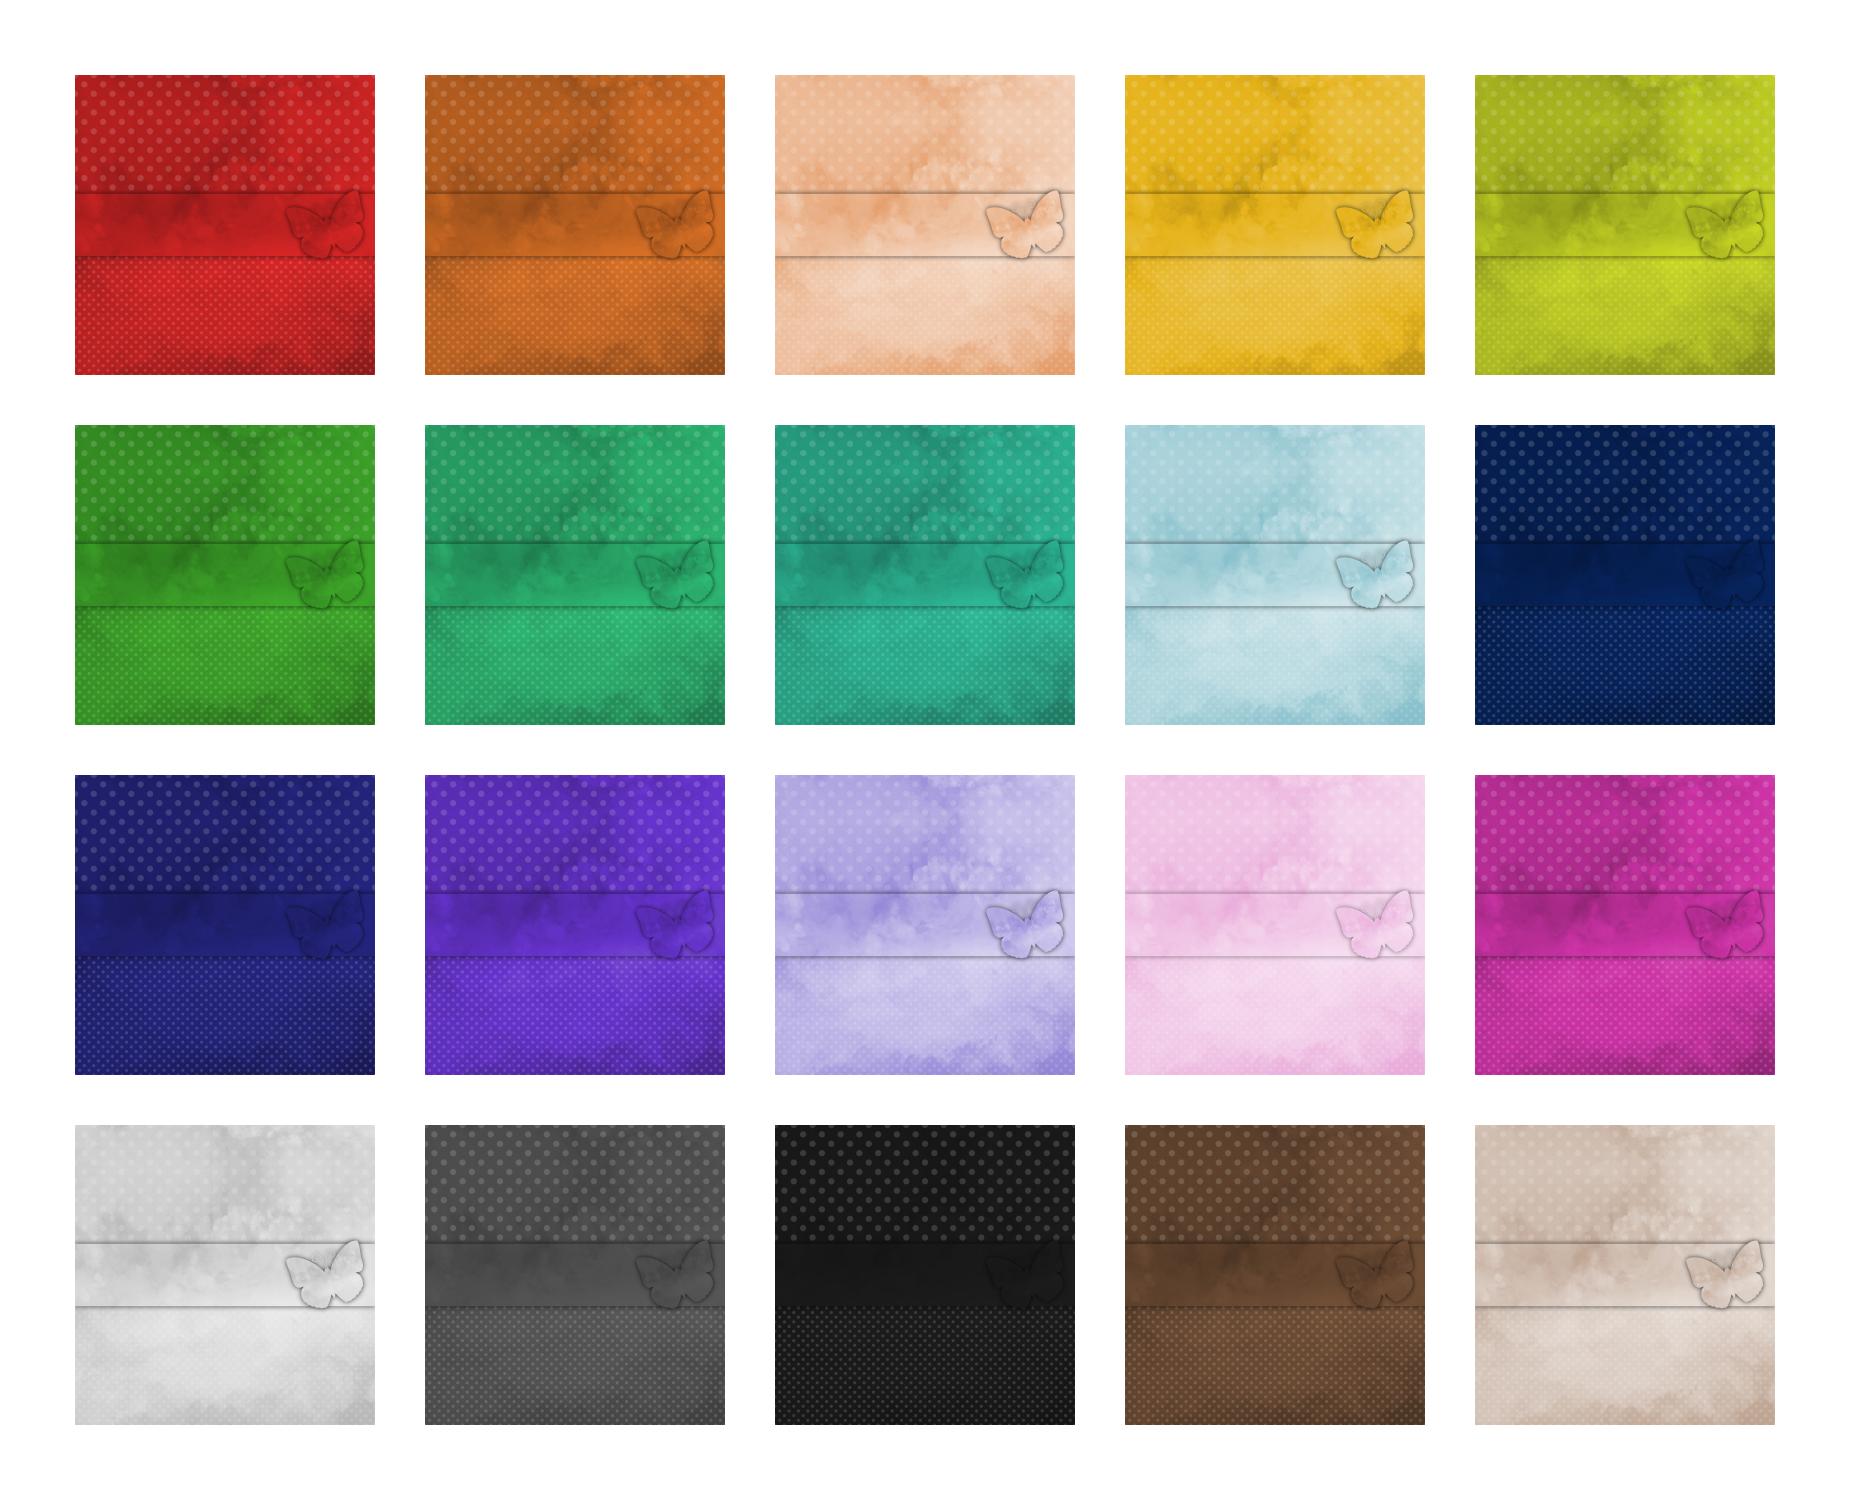 Zen PLR Digital Papers Watercolor Butterflies and Polka Dots